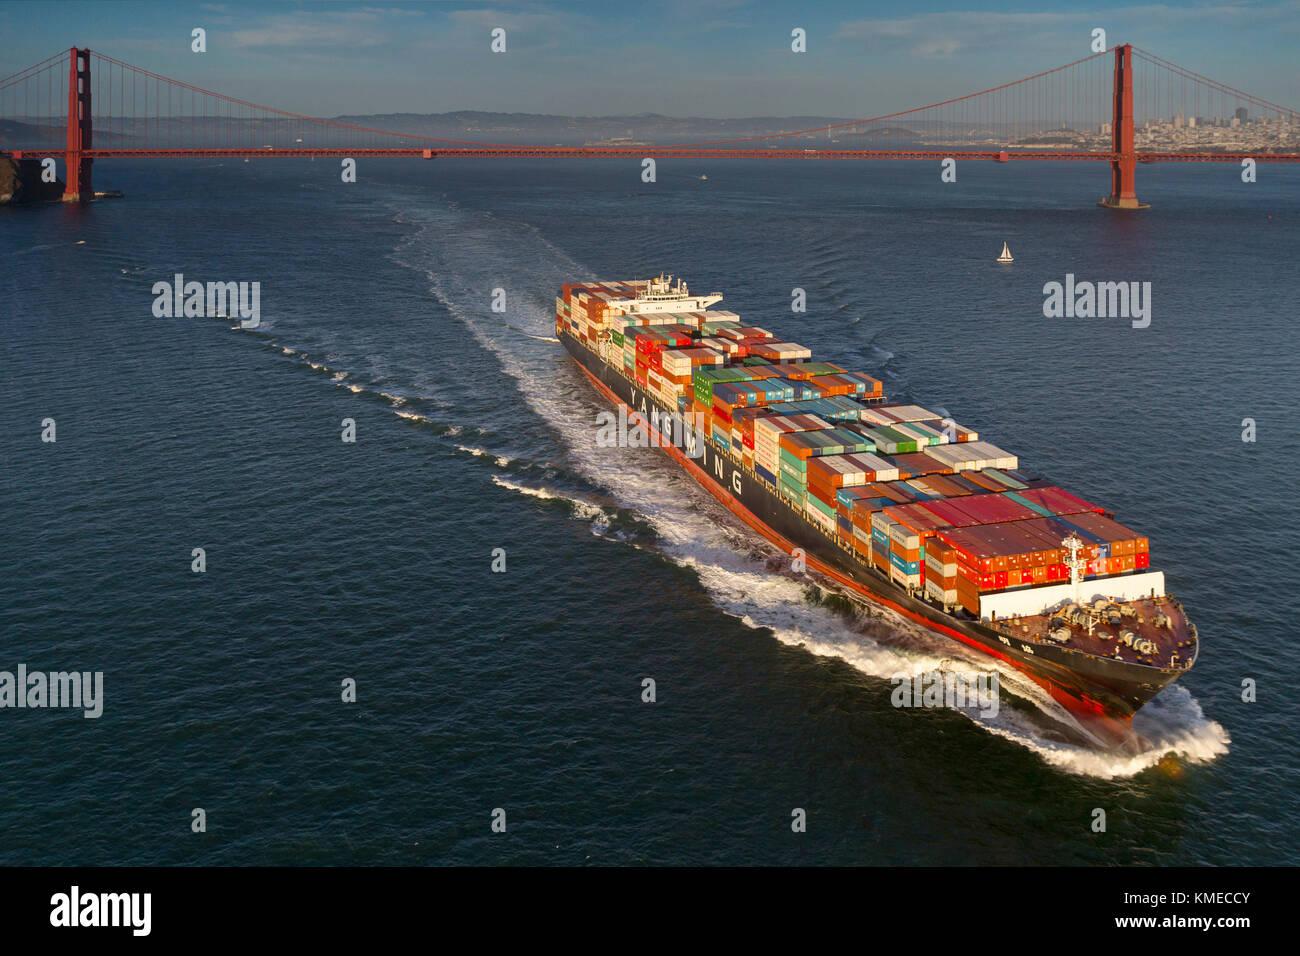 Freighter sailing against Golden Gate Bridge,San Francisco,California,USA - Stock Image